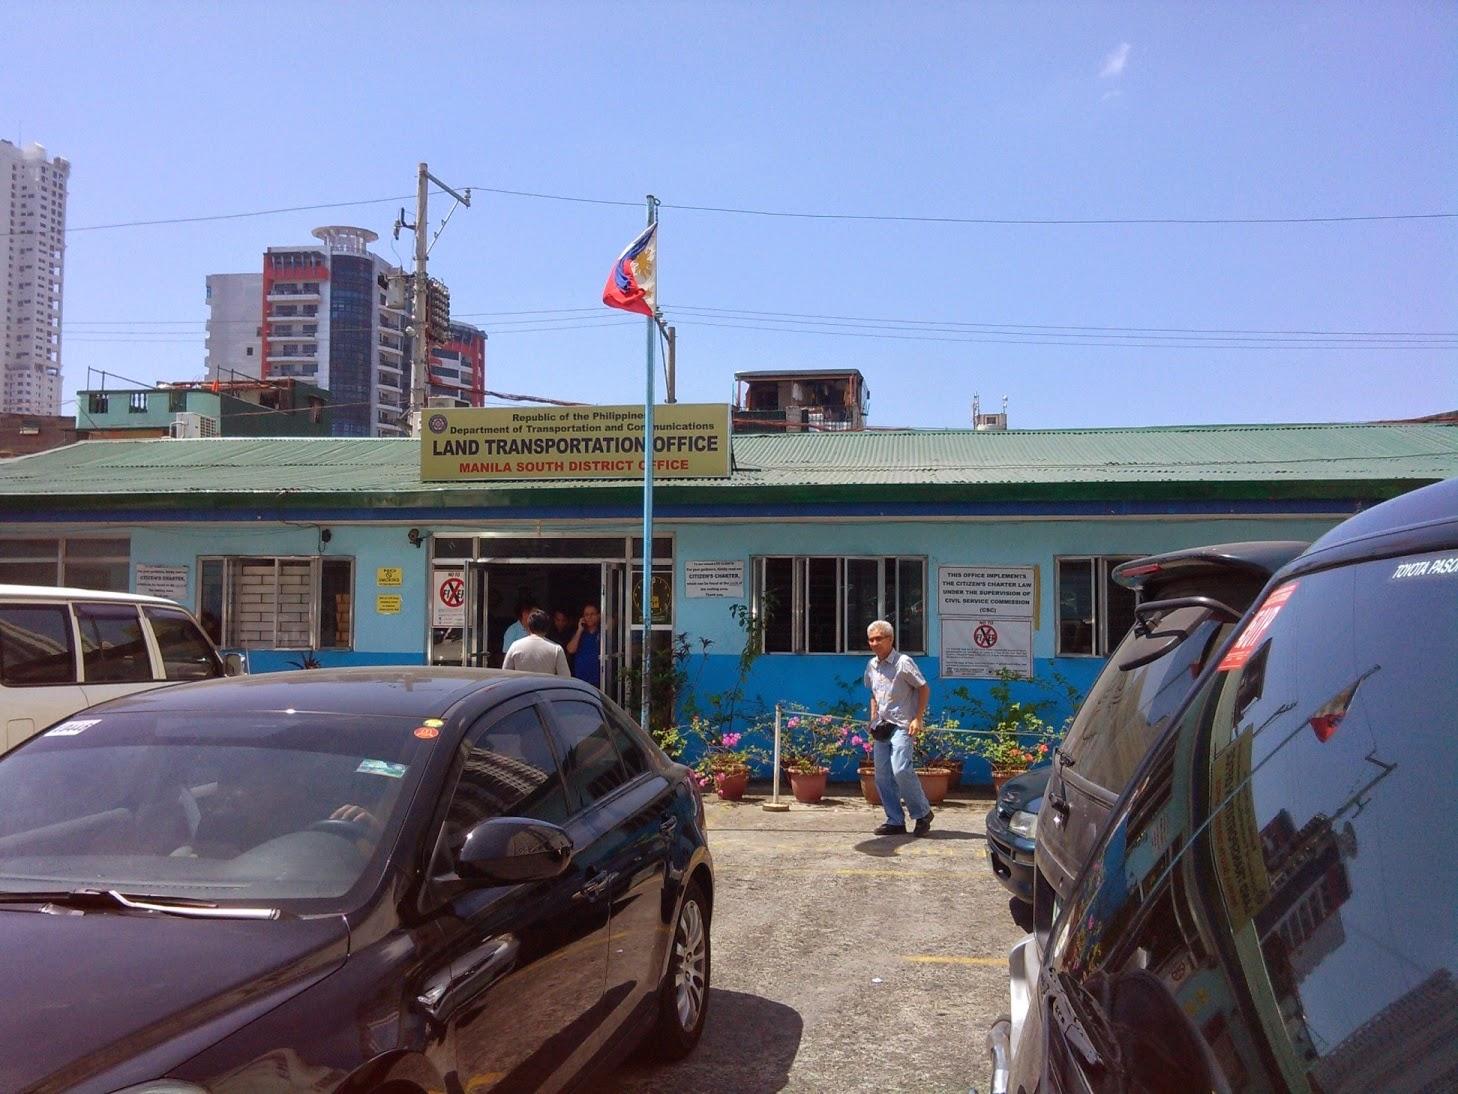 Lto manila south district office